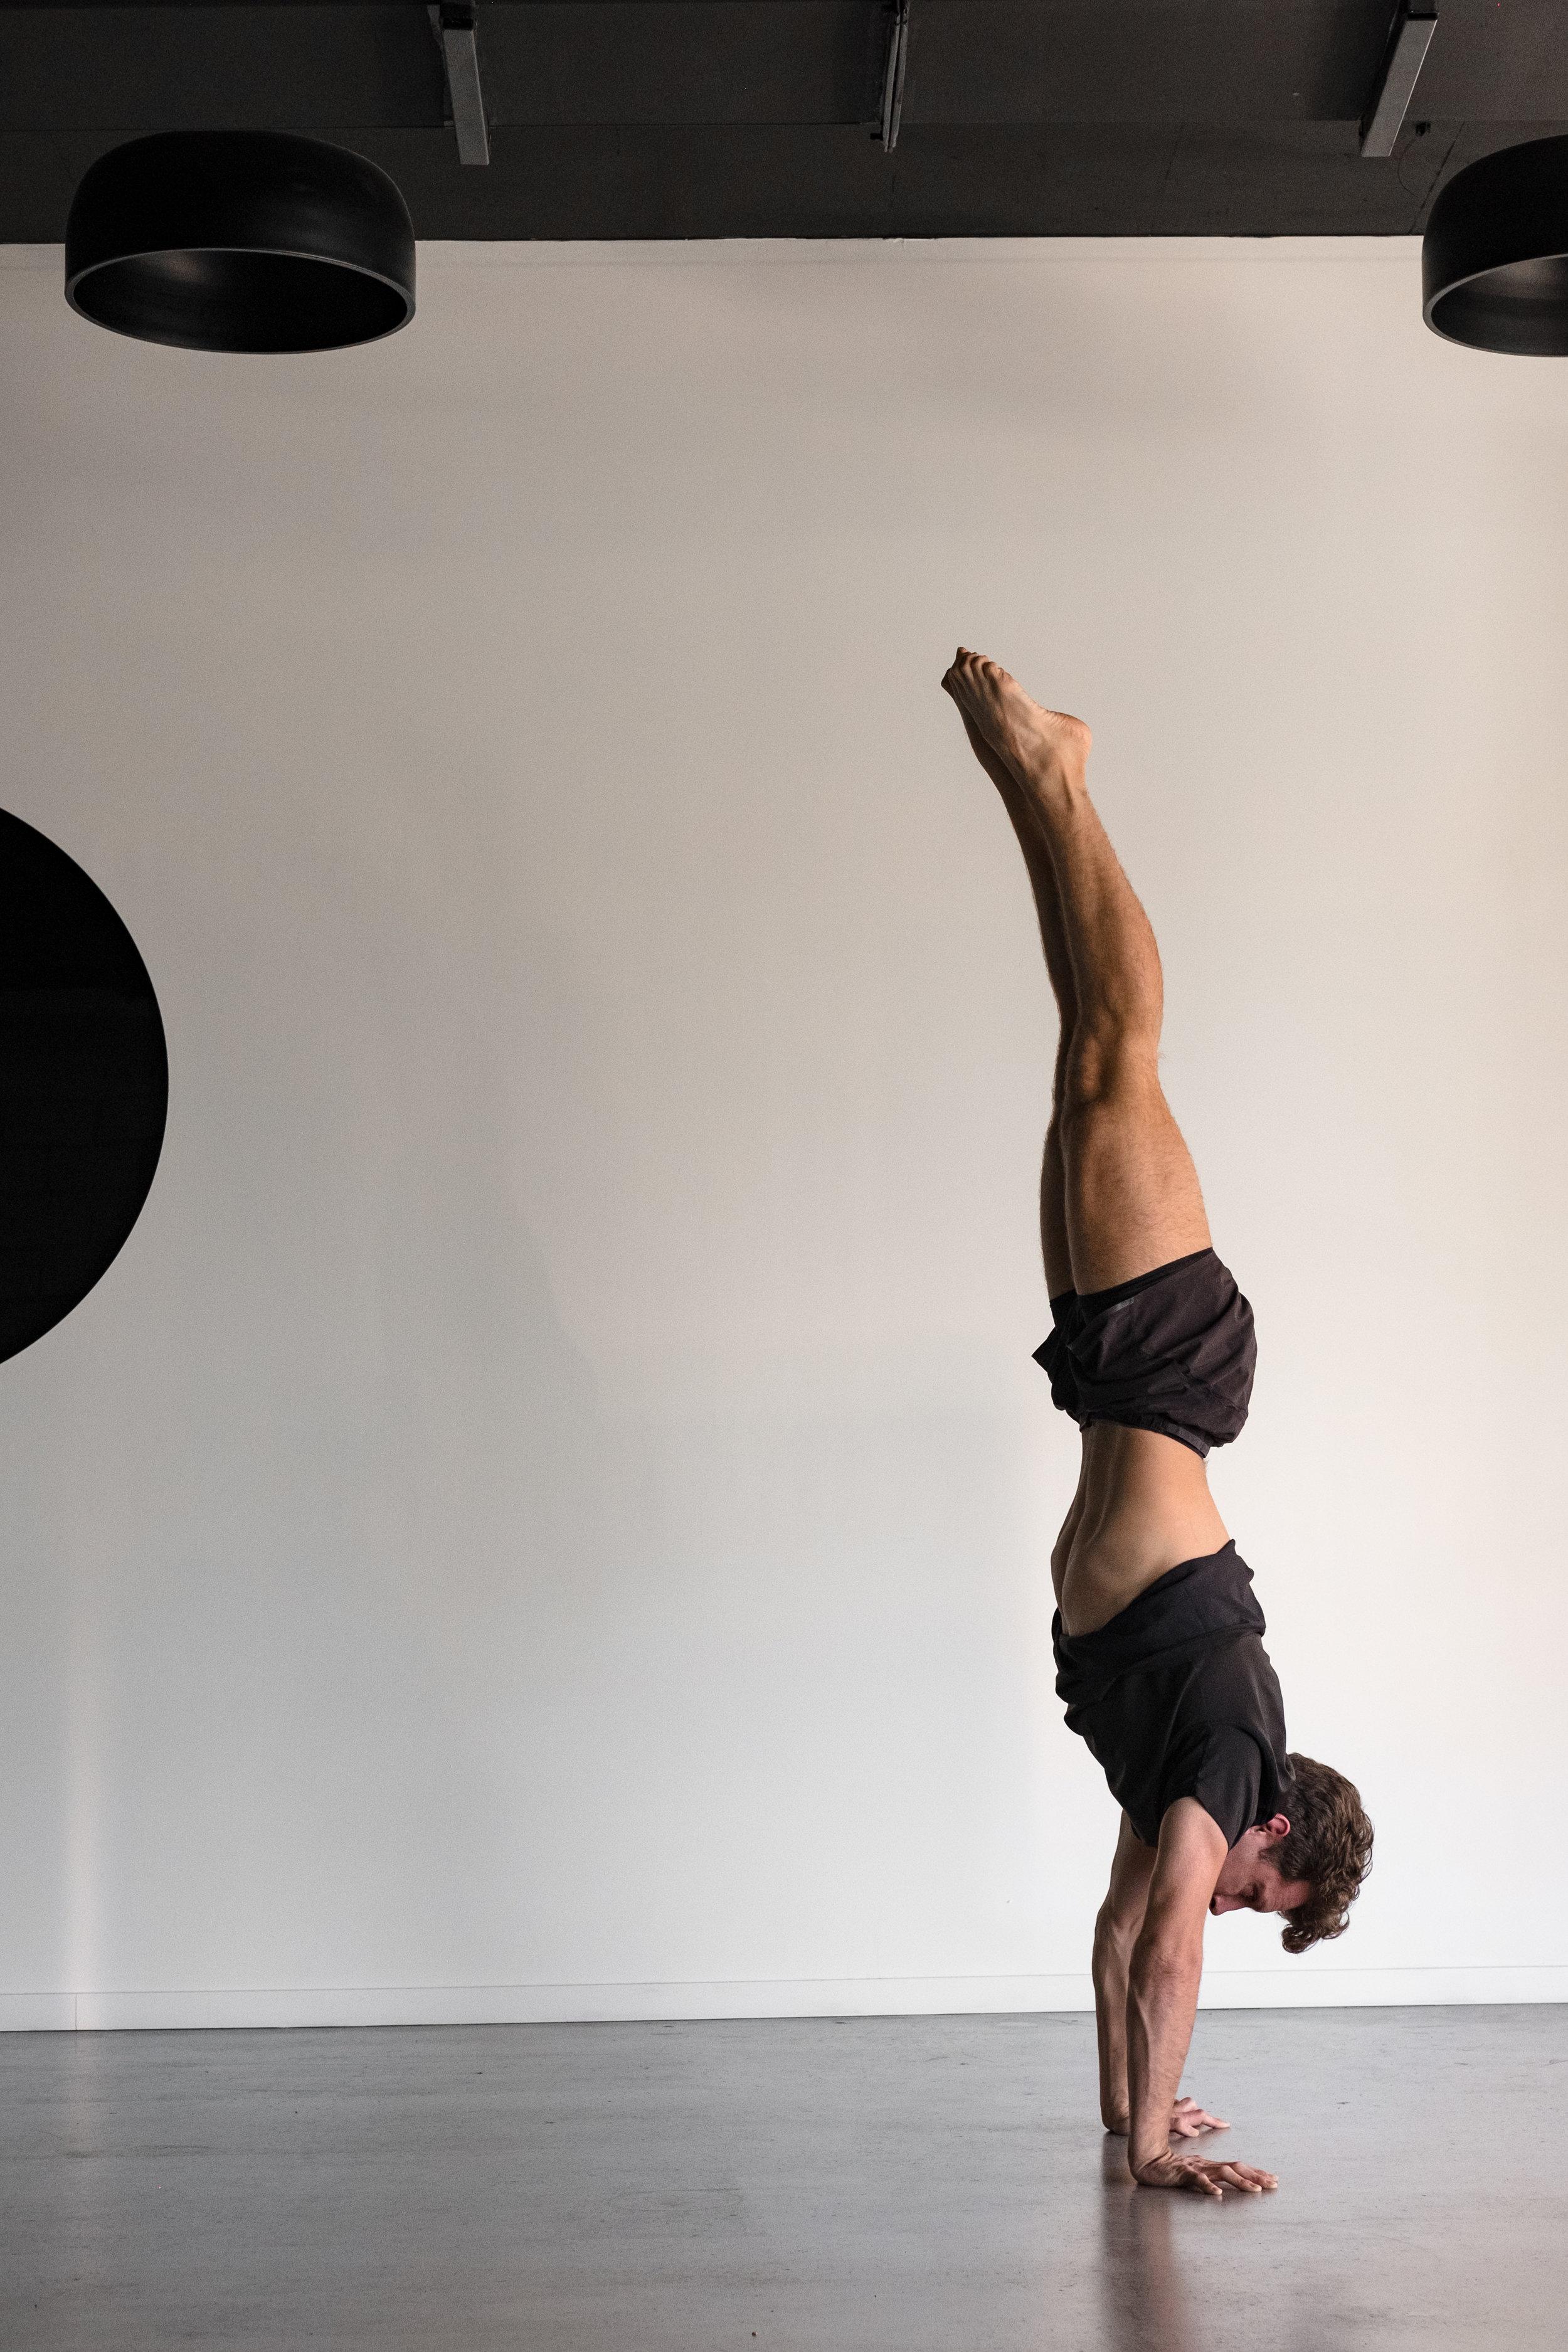 Handstand_Preparation_Training (30 of 38).jpg